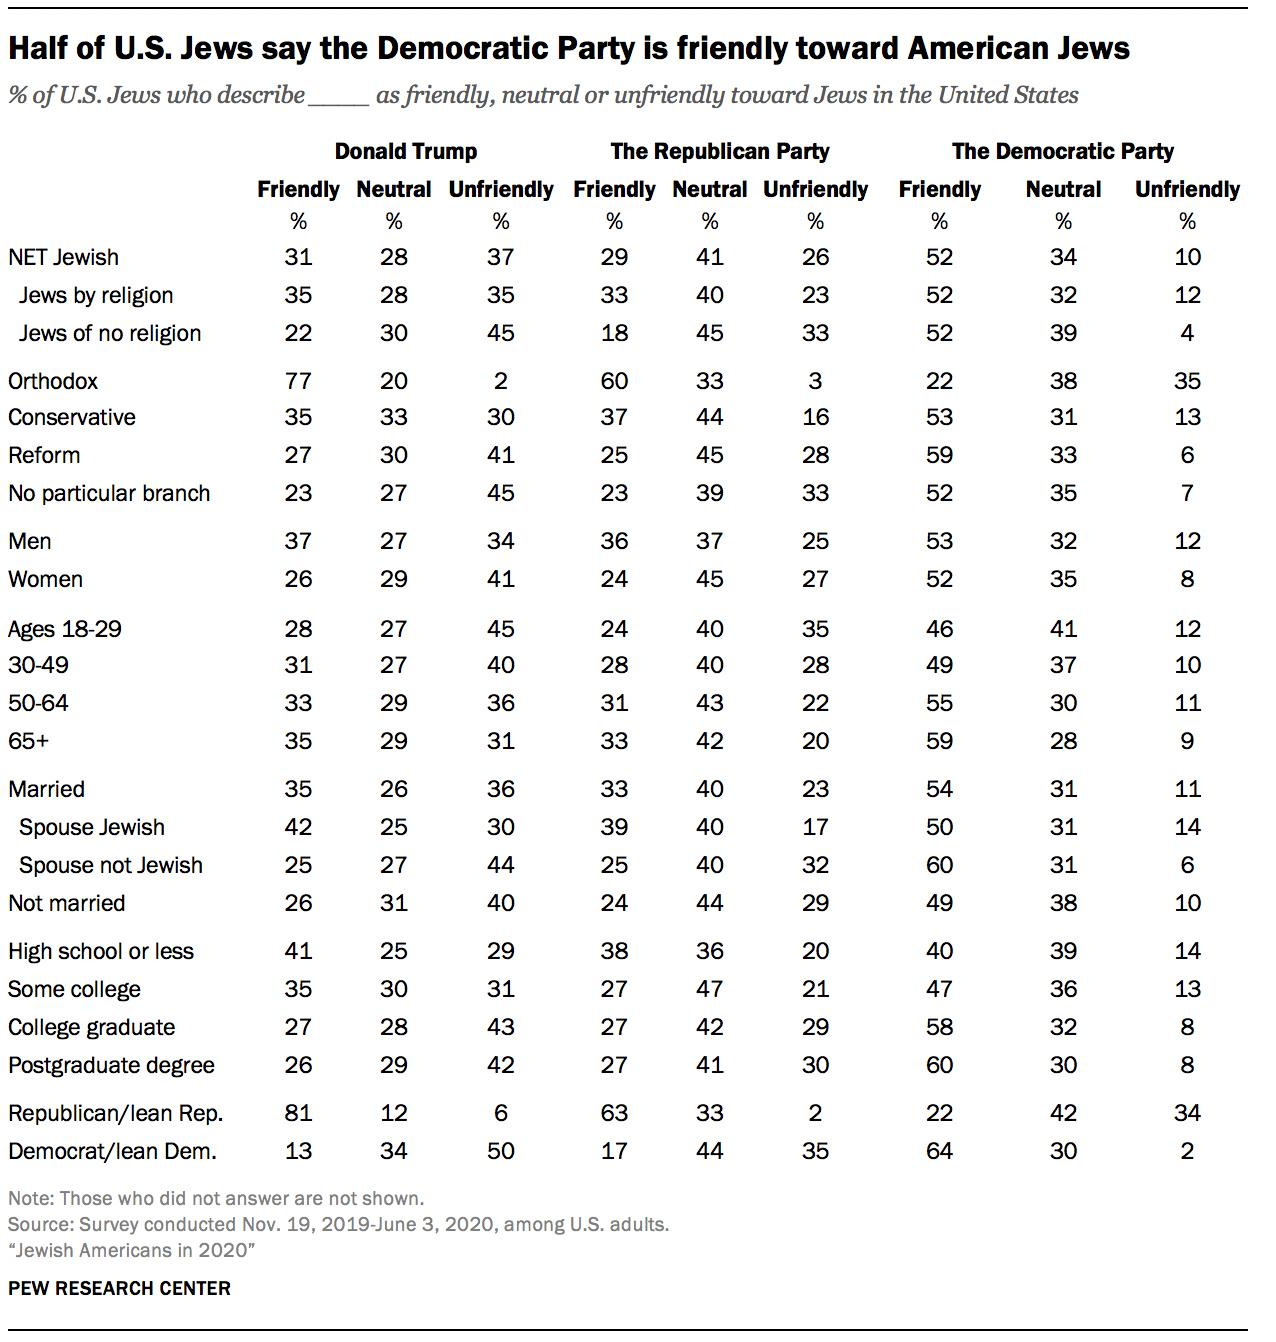 Half of U.S. Jews say the Democratic Party is friendly toward American Jews